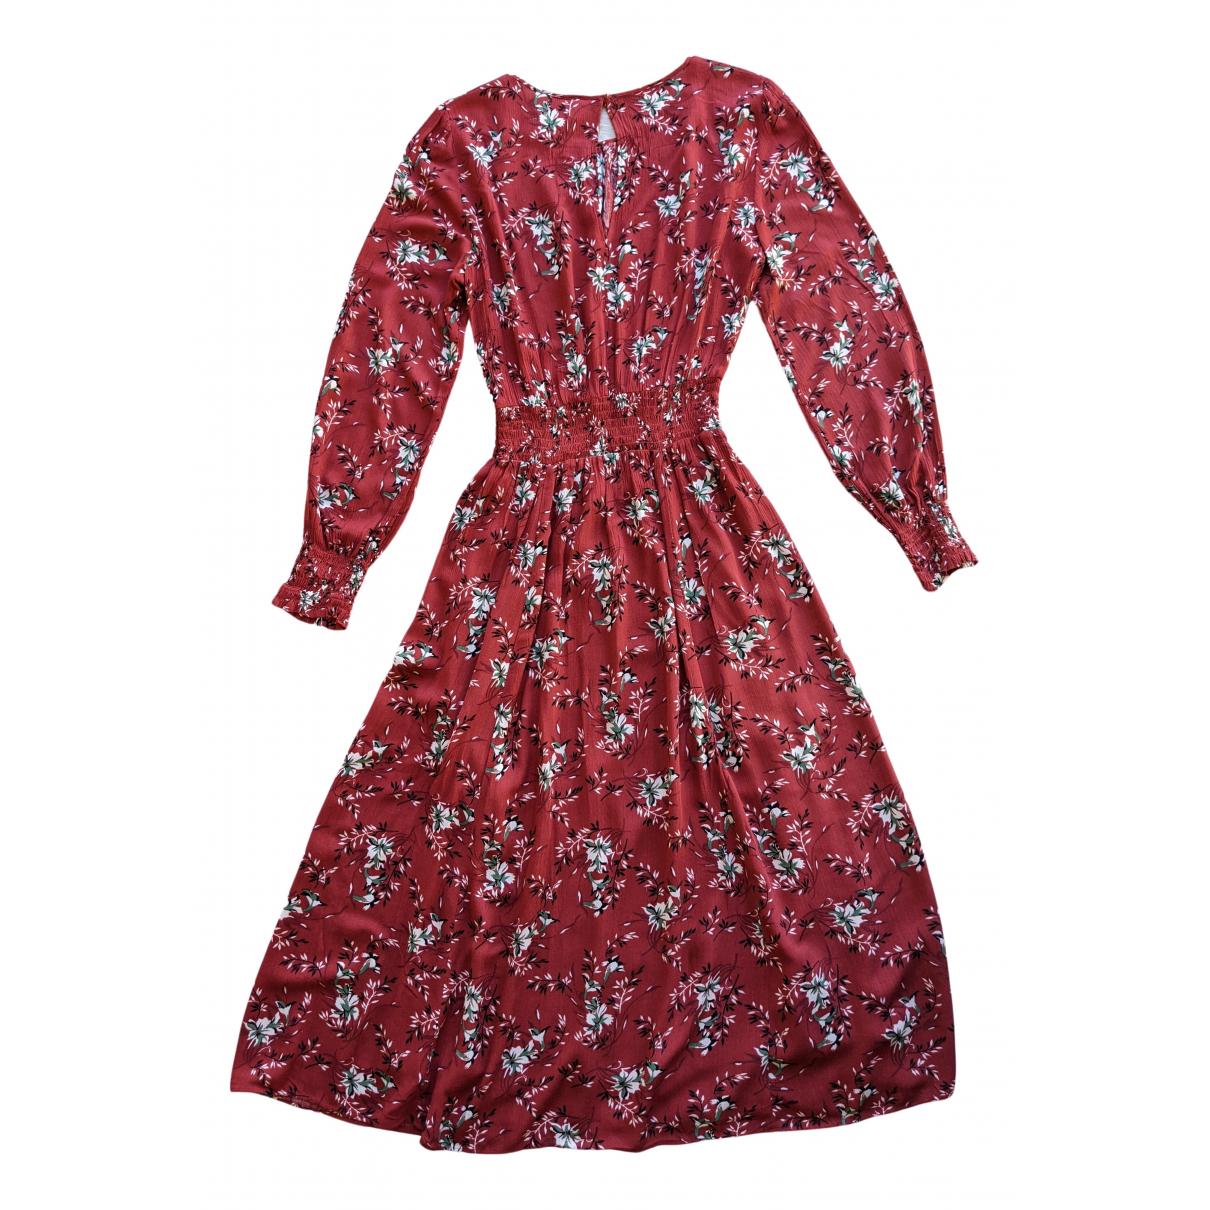 Sézane \N Red dress for Women 38 FR